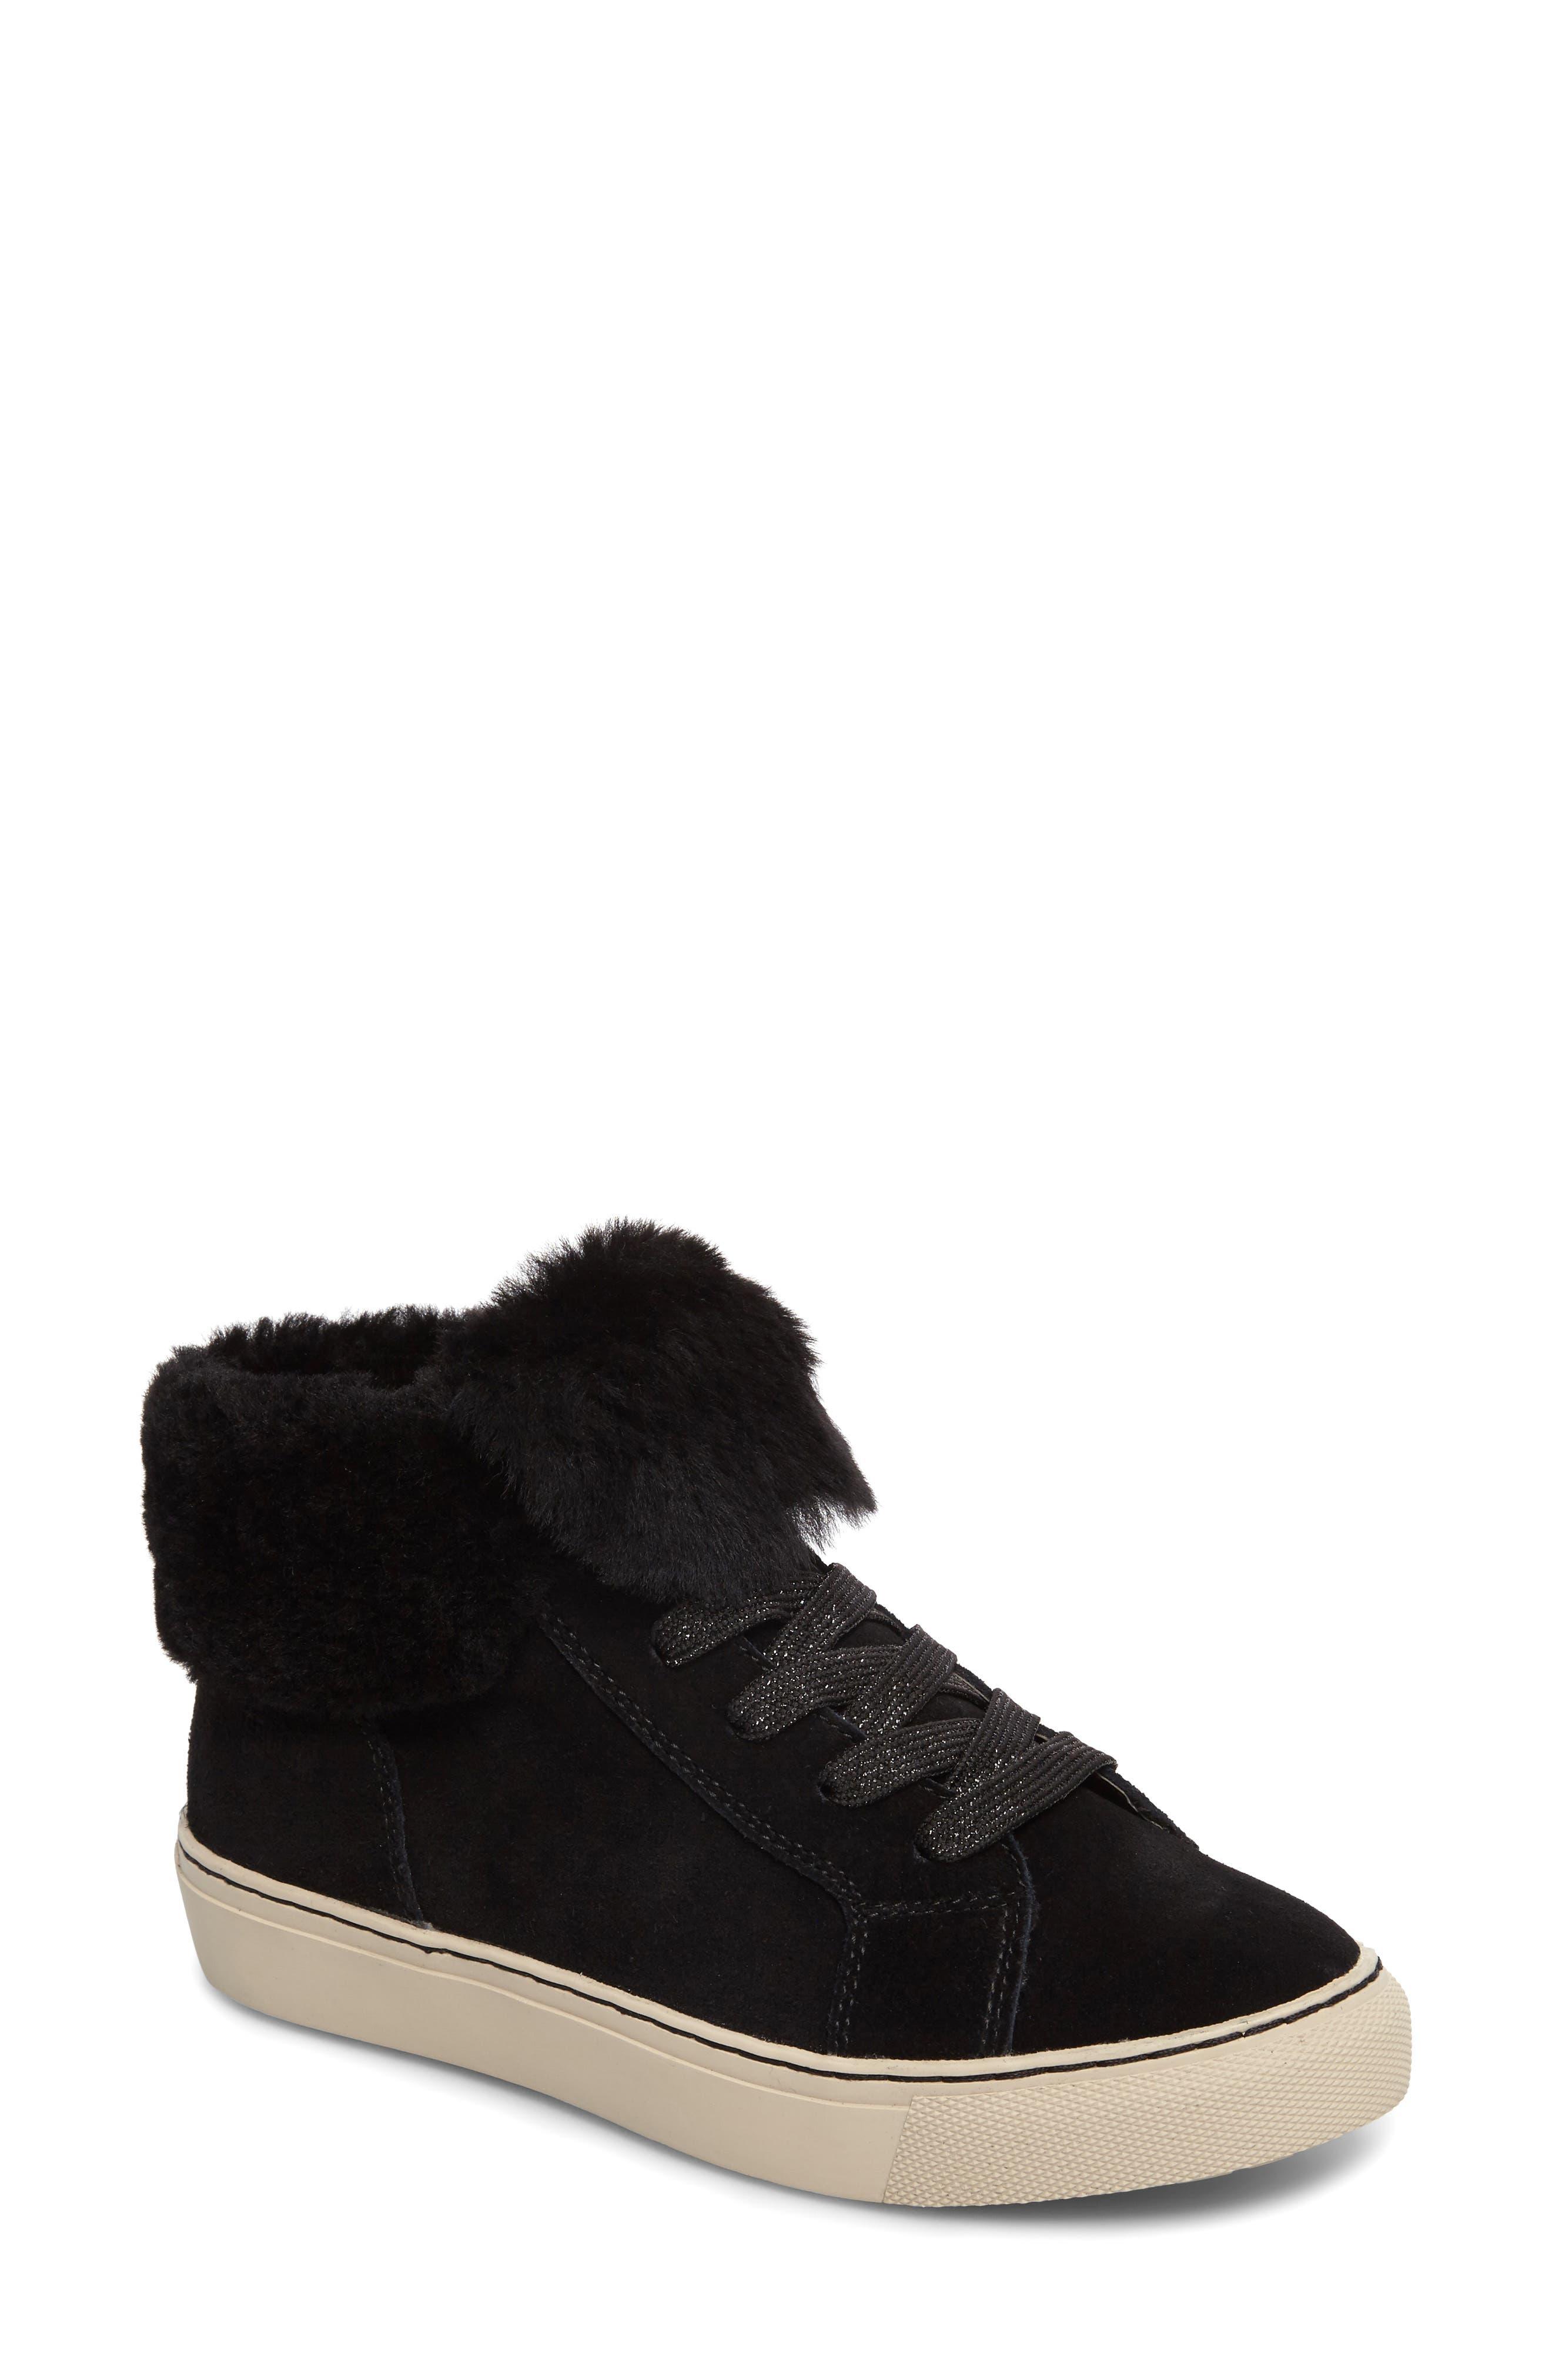 Downey Waterproof Genuine Shearling Sneaker,                             Main thumbnail 1, color,                             Black Suede